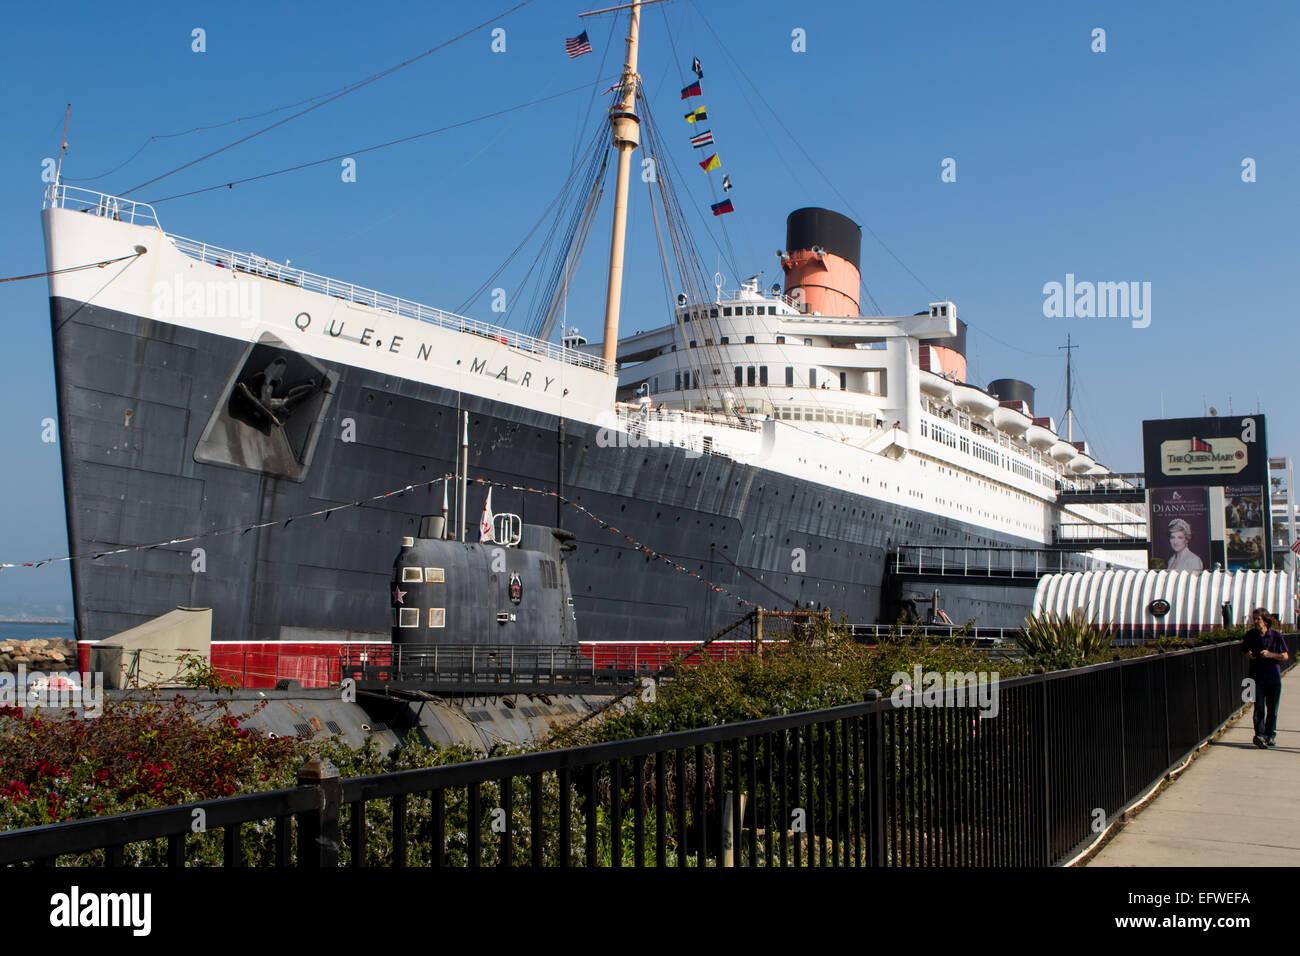 RMS Queen Mary à Long Beach California USA Banque D'Images